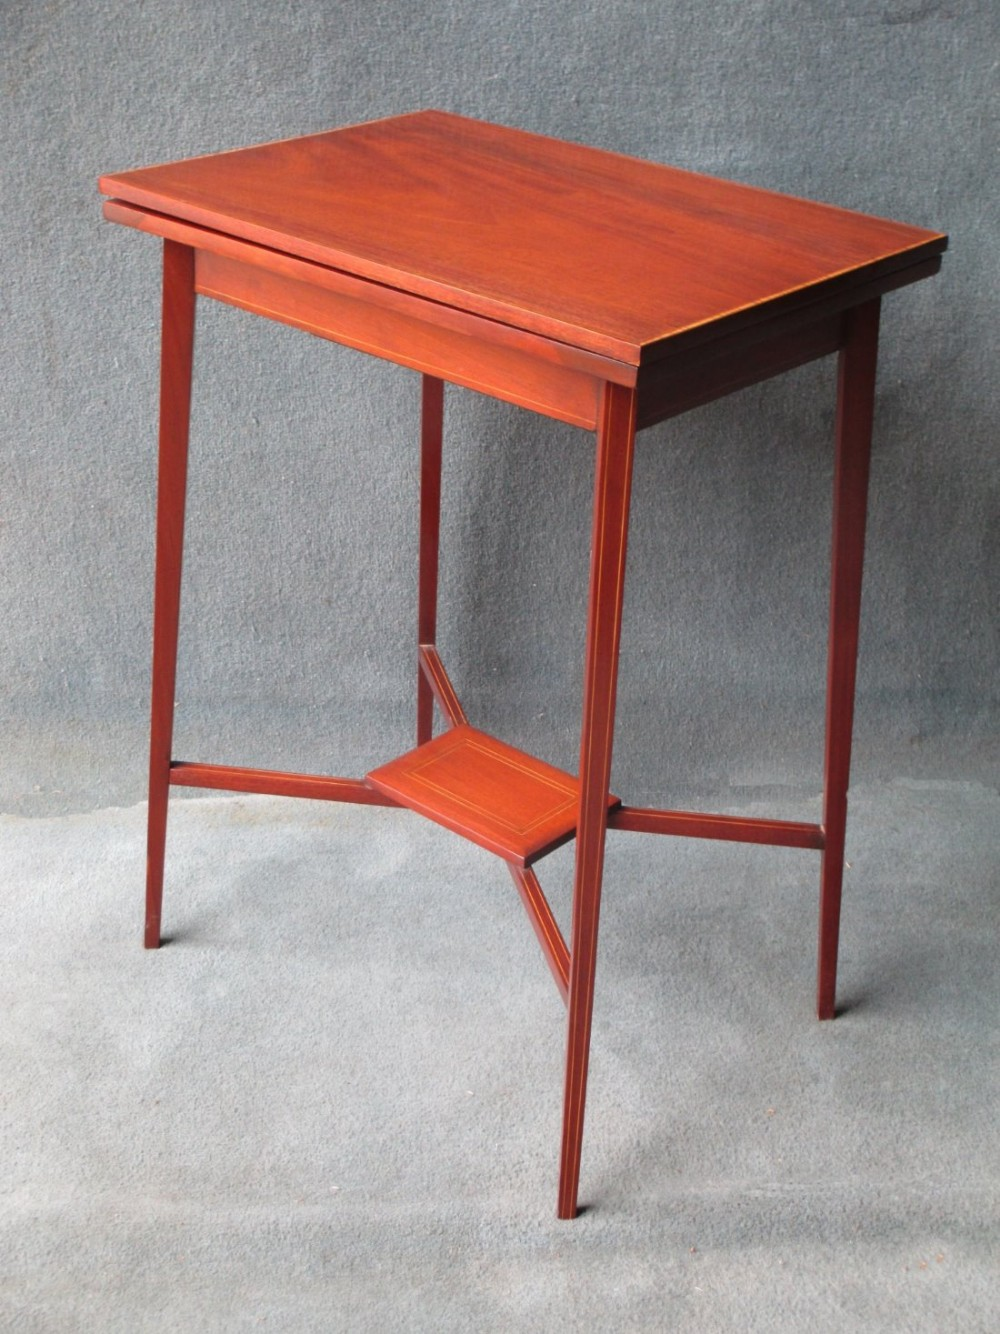 a small foldover card table